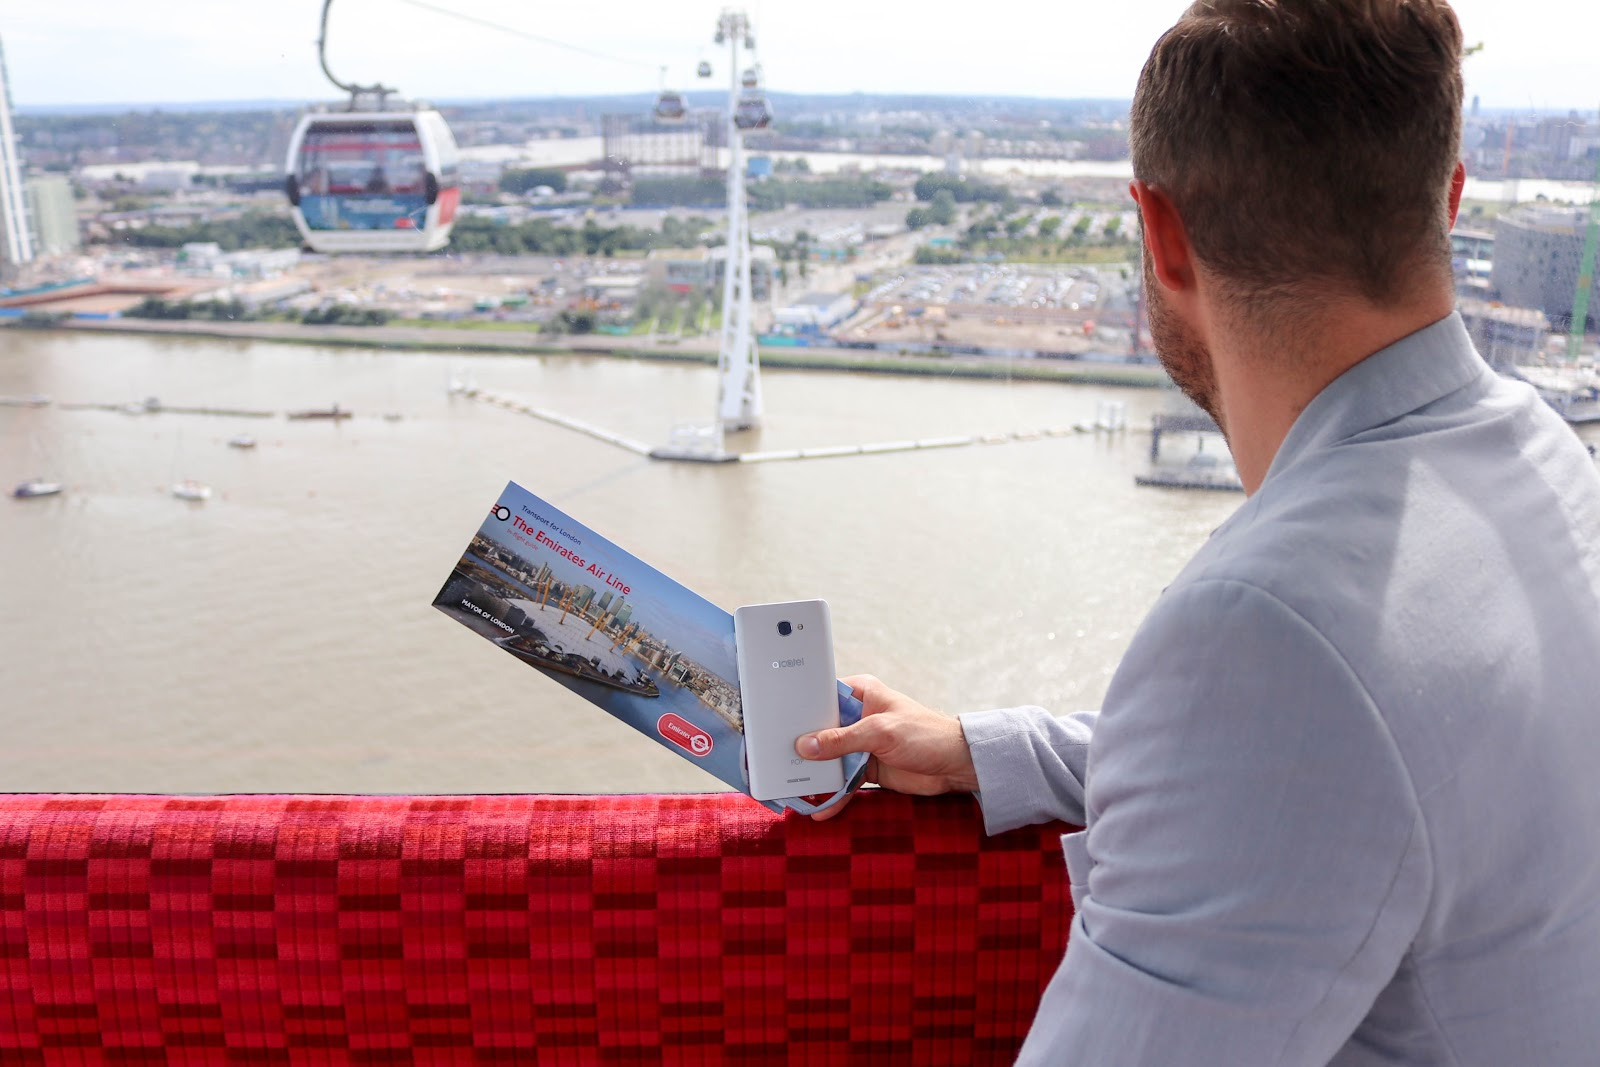 Alcatel POP 4 Emirates Air Line London